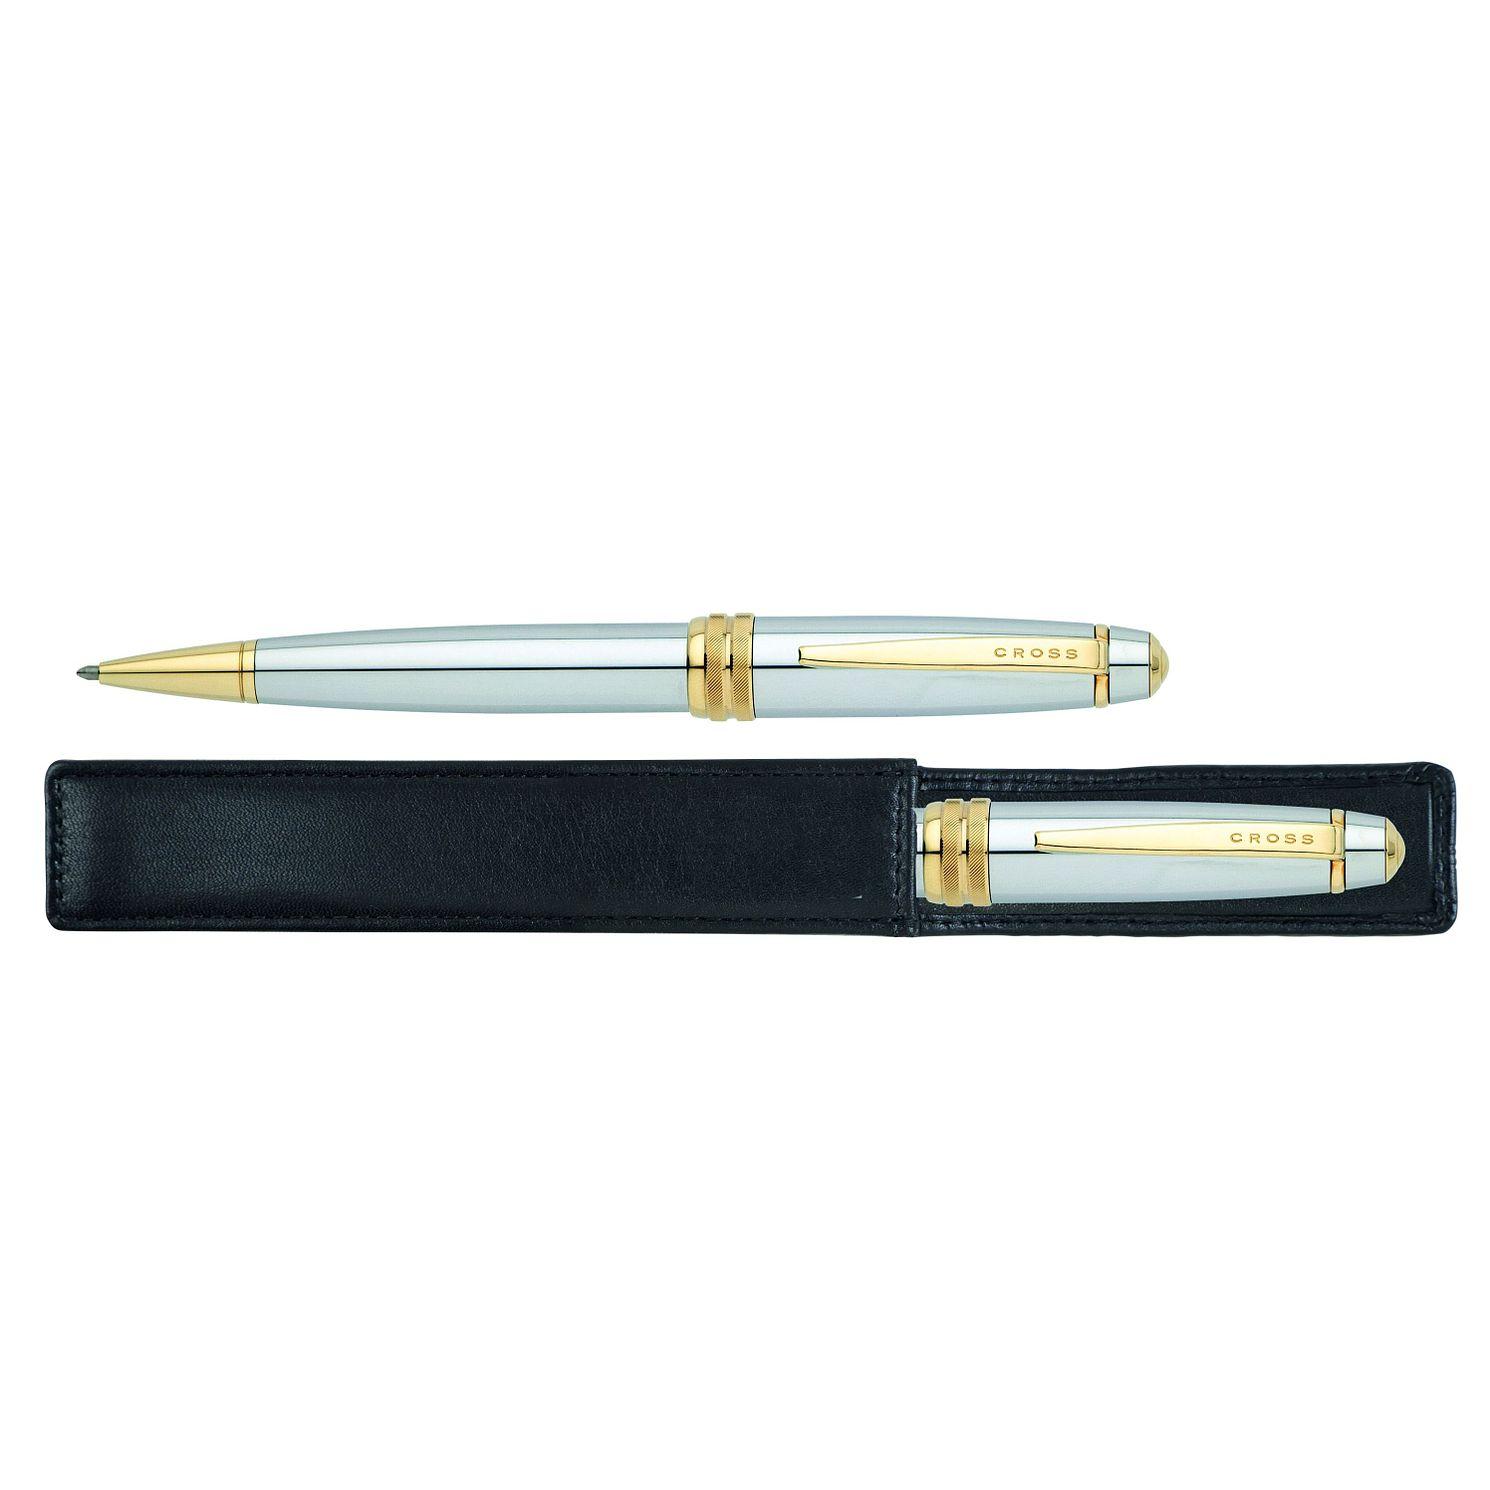 Cross Bailey Medalist Ballpoint Pen in Gift Box AT0452-6